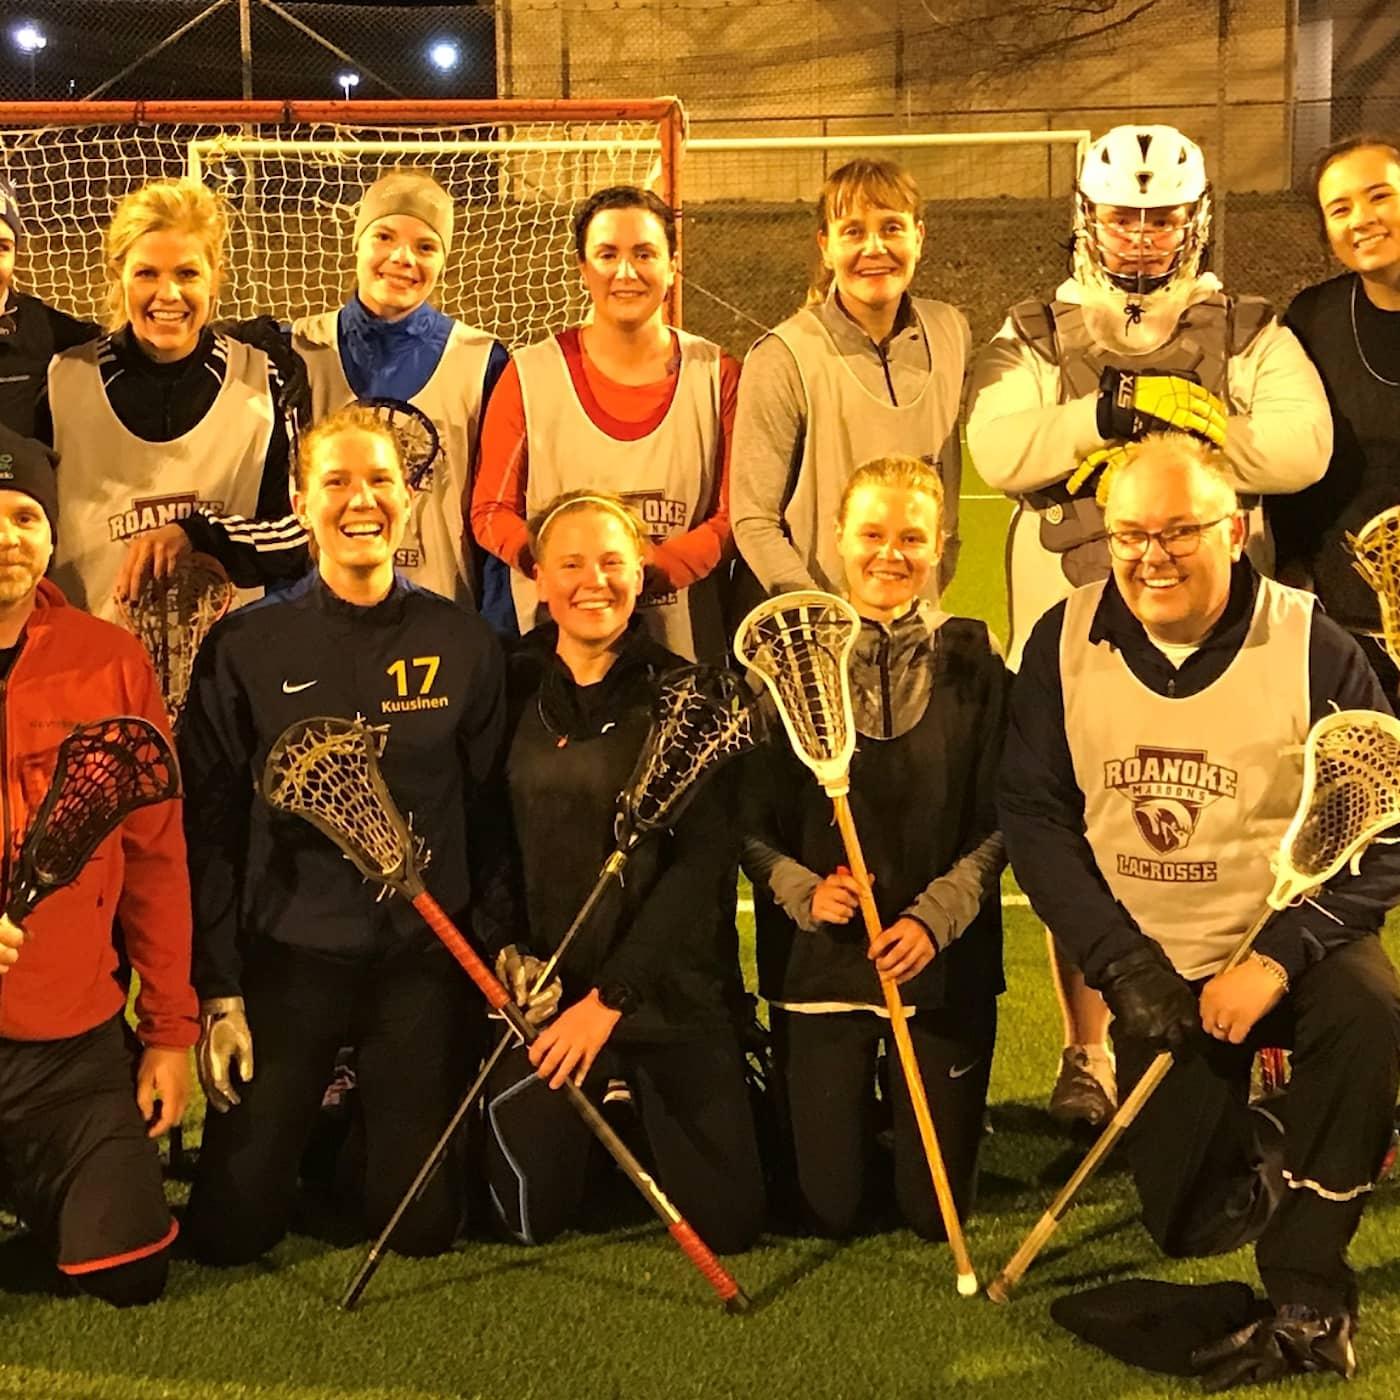 Persson och Marhlo testar lacrosse